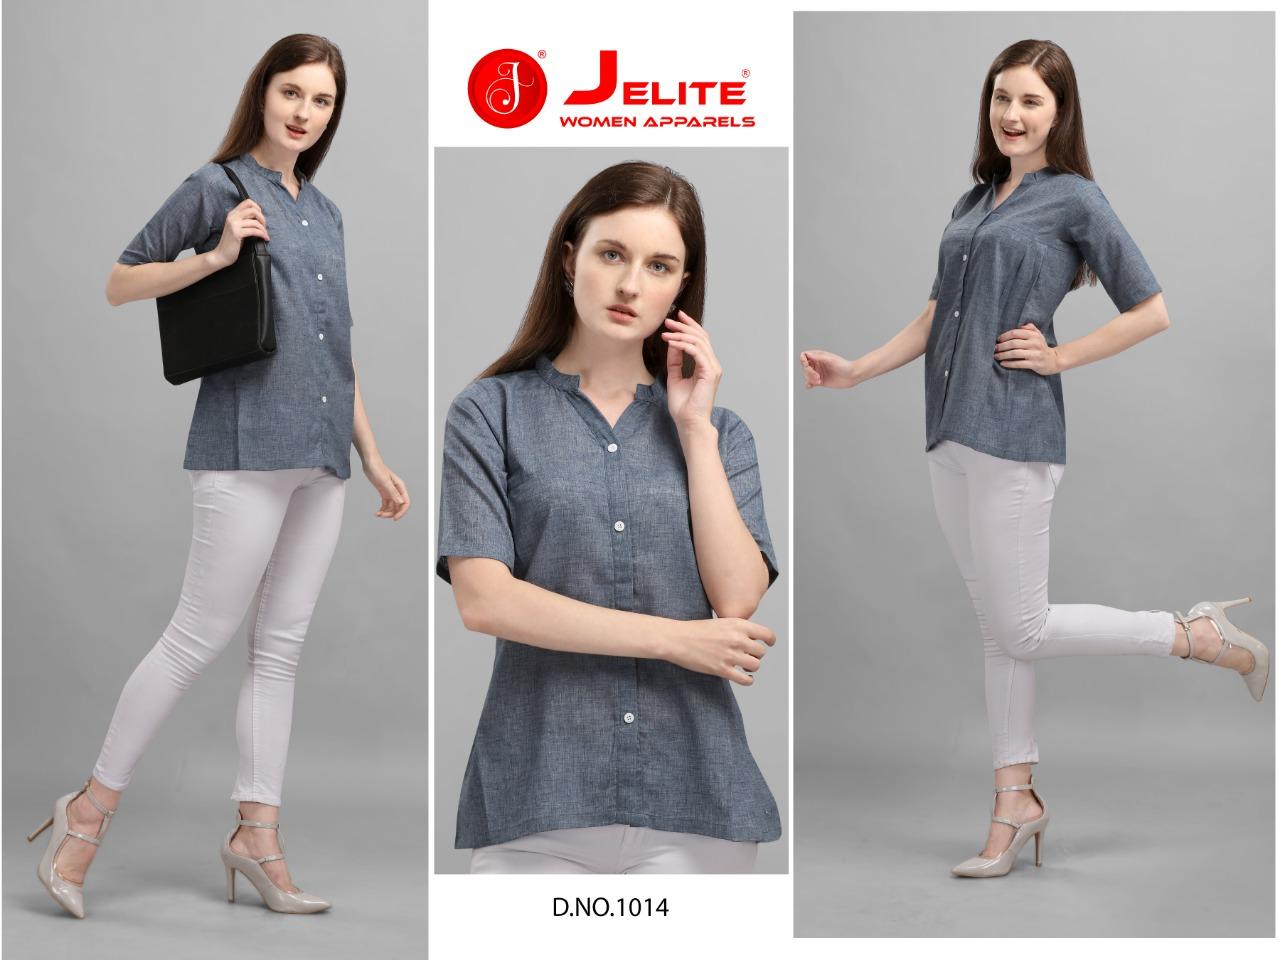 Jelite presents  Carnation vol 3 Fancy  Ladies Top Collection